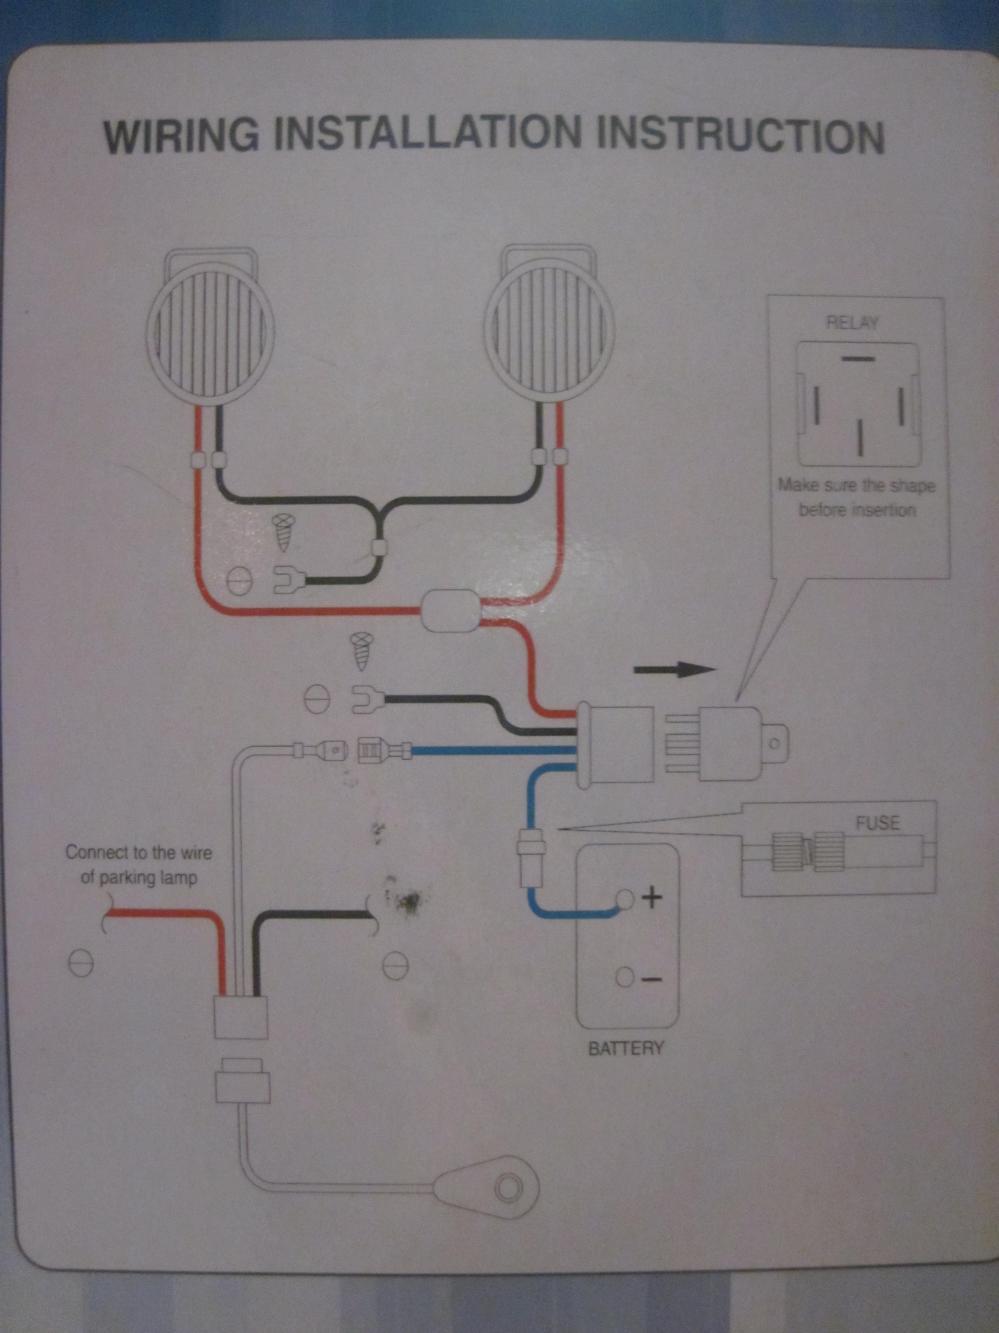 medium resolution of 2010 kawasaki teryx fuse box wiring diagram mega2010 kawasaki teryx wiring diagram wiring diagram experts 2010